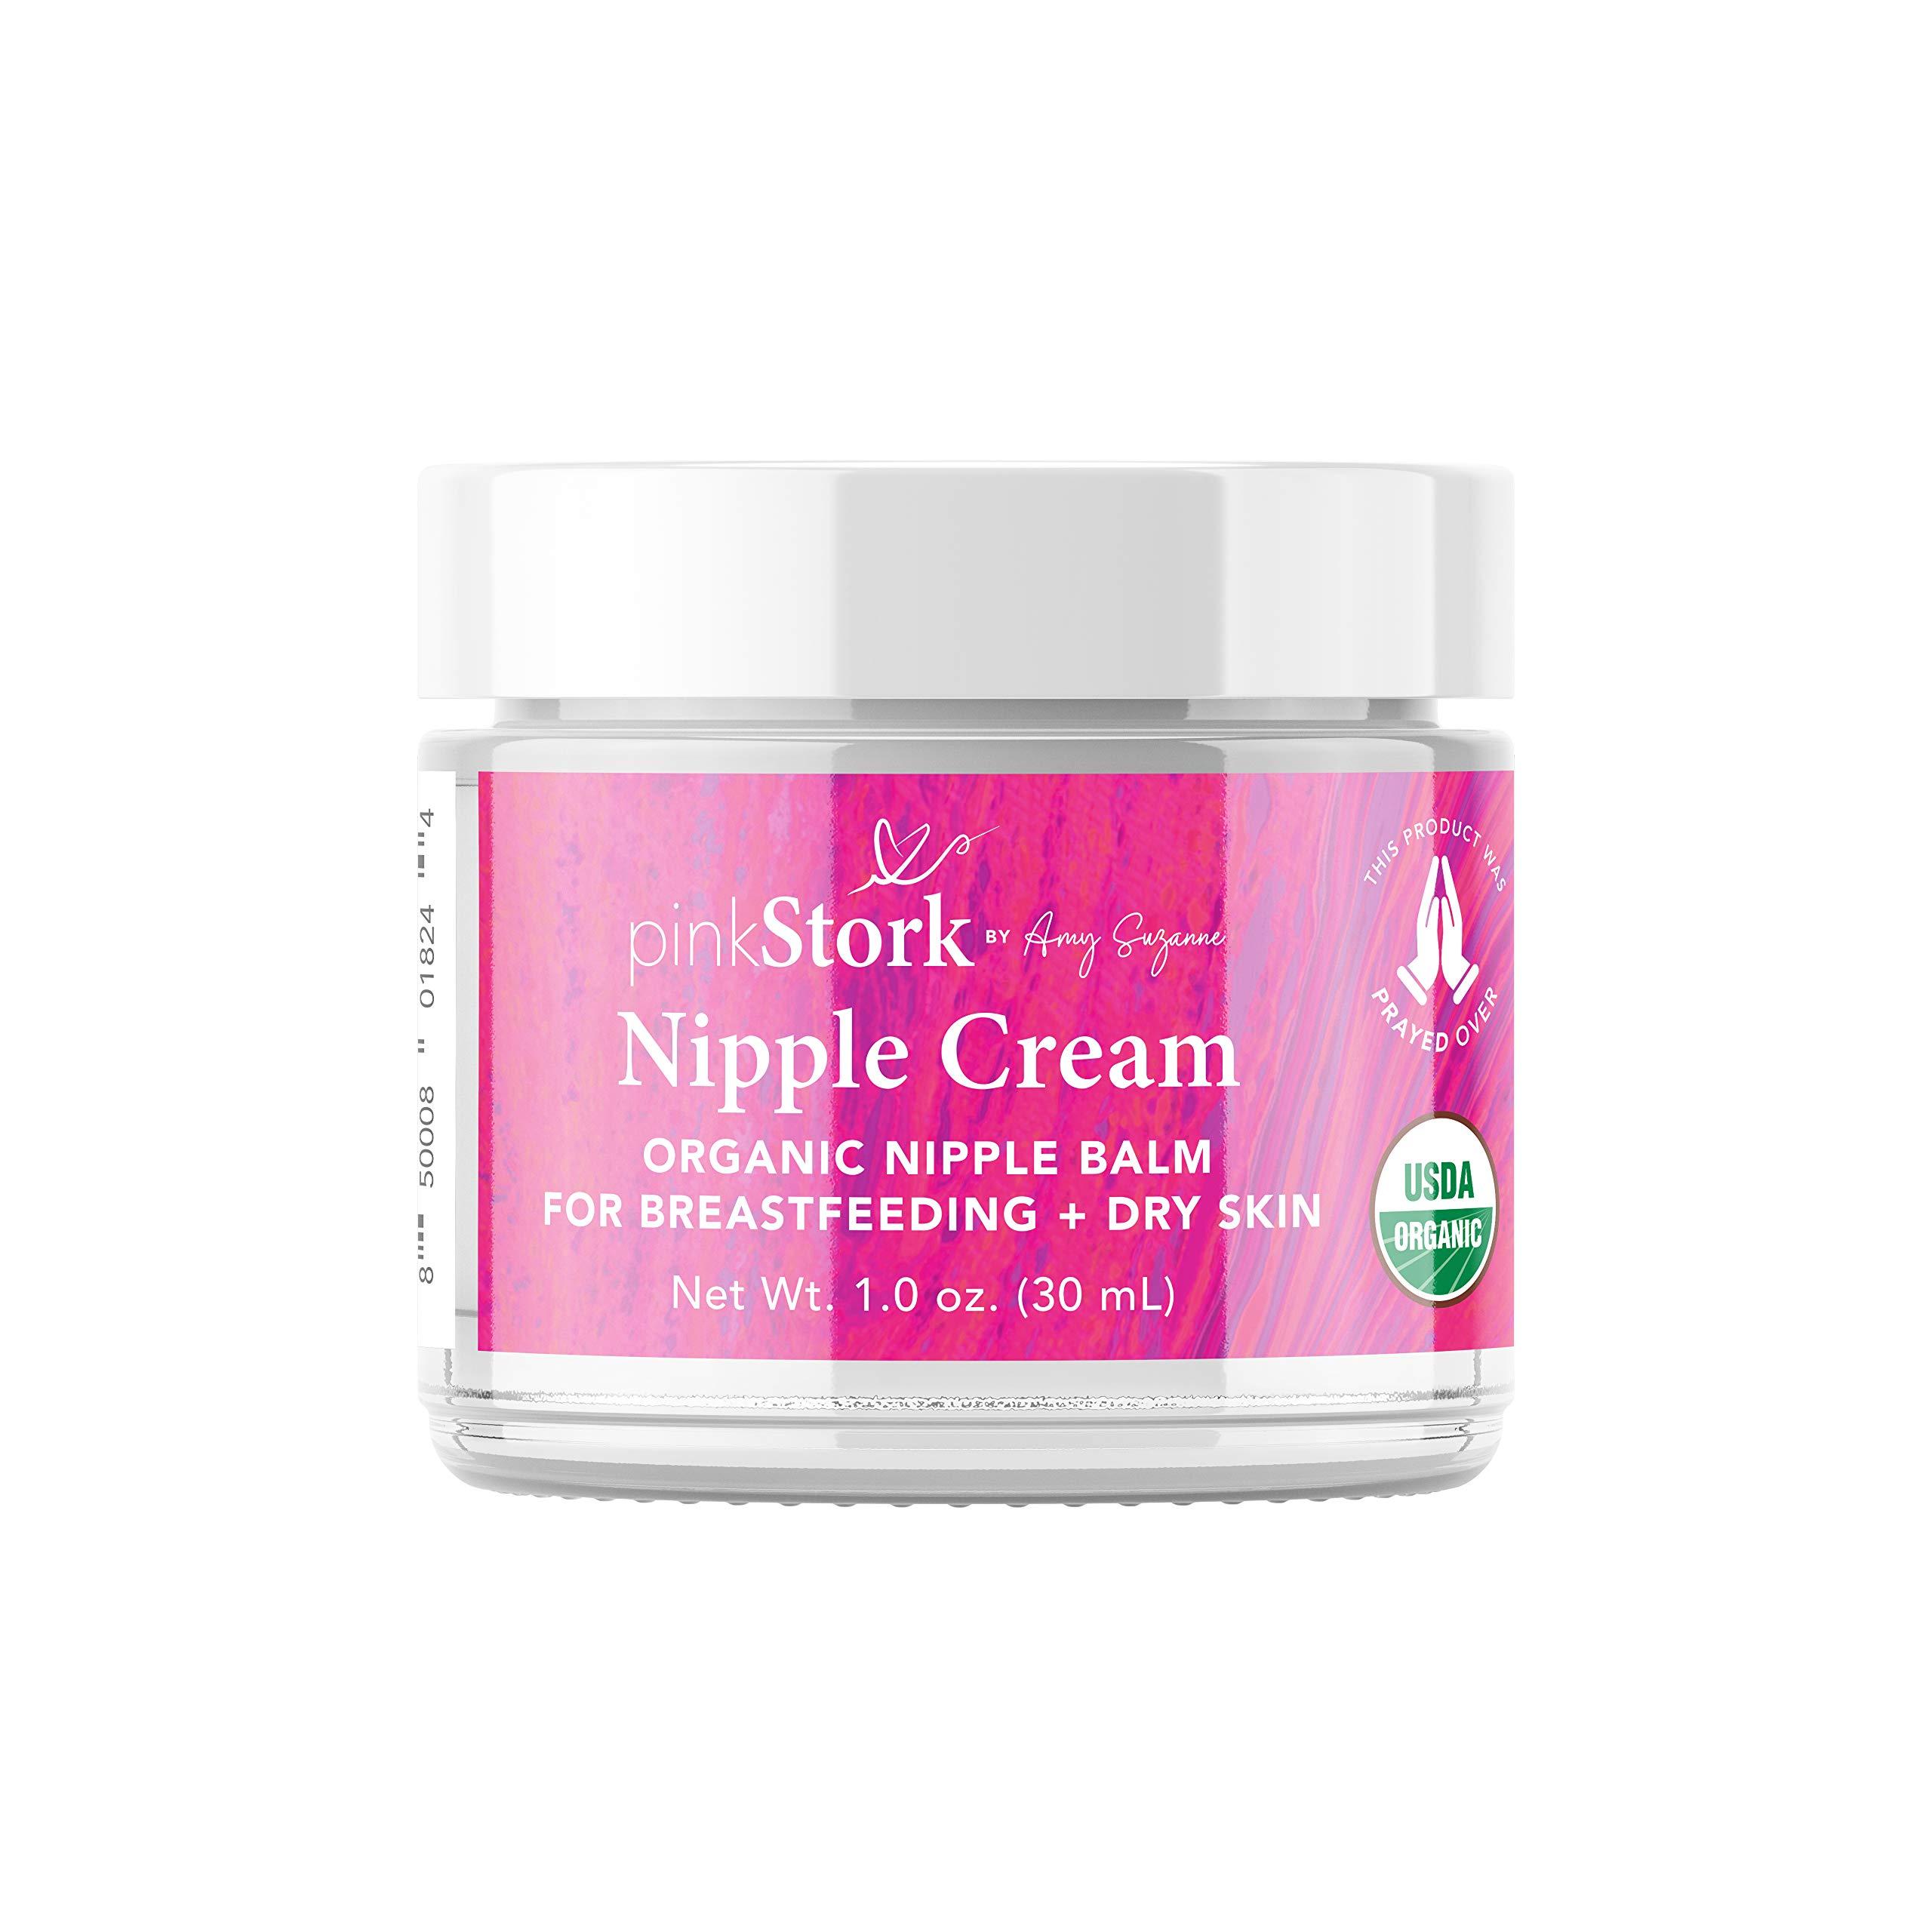 Pink Stork Nipple Cream: 100% Organic Breastfeeding Essentials with Jojoba Oil, Coconut Oil, Shea Butter, Lanolin Free, Heals Cracks + Pains, Women-Owned, 1 oz